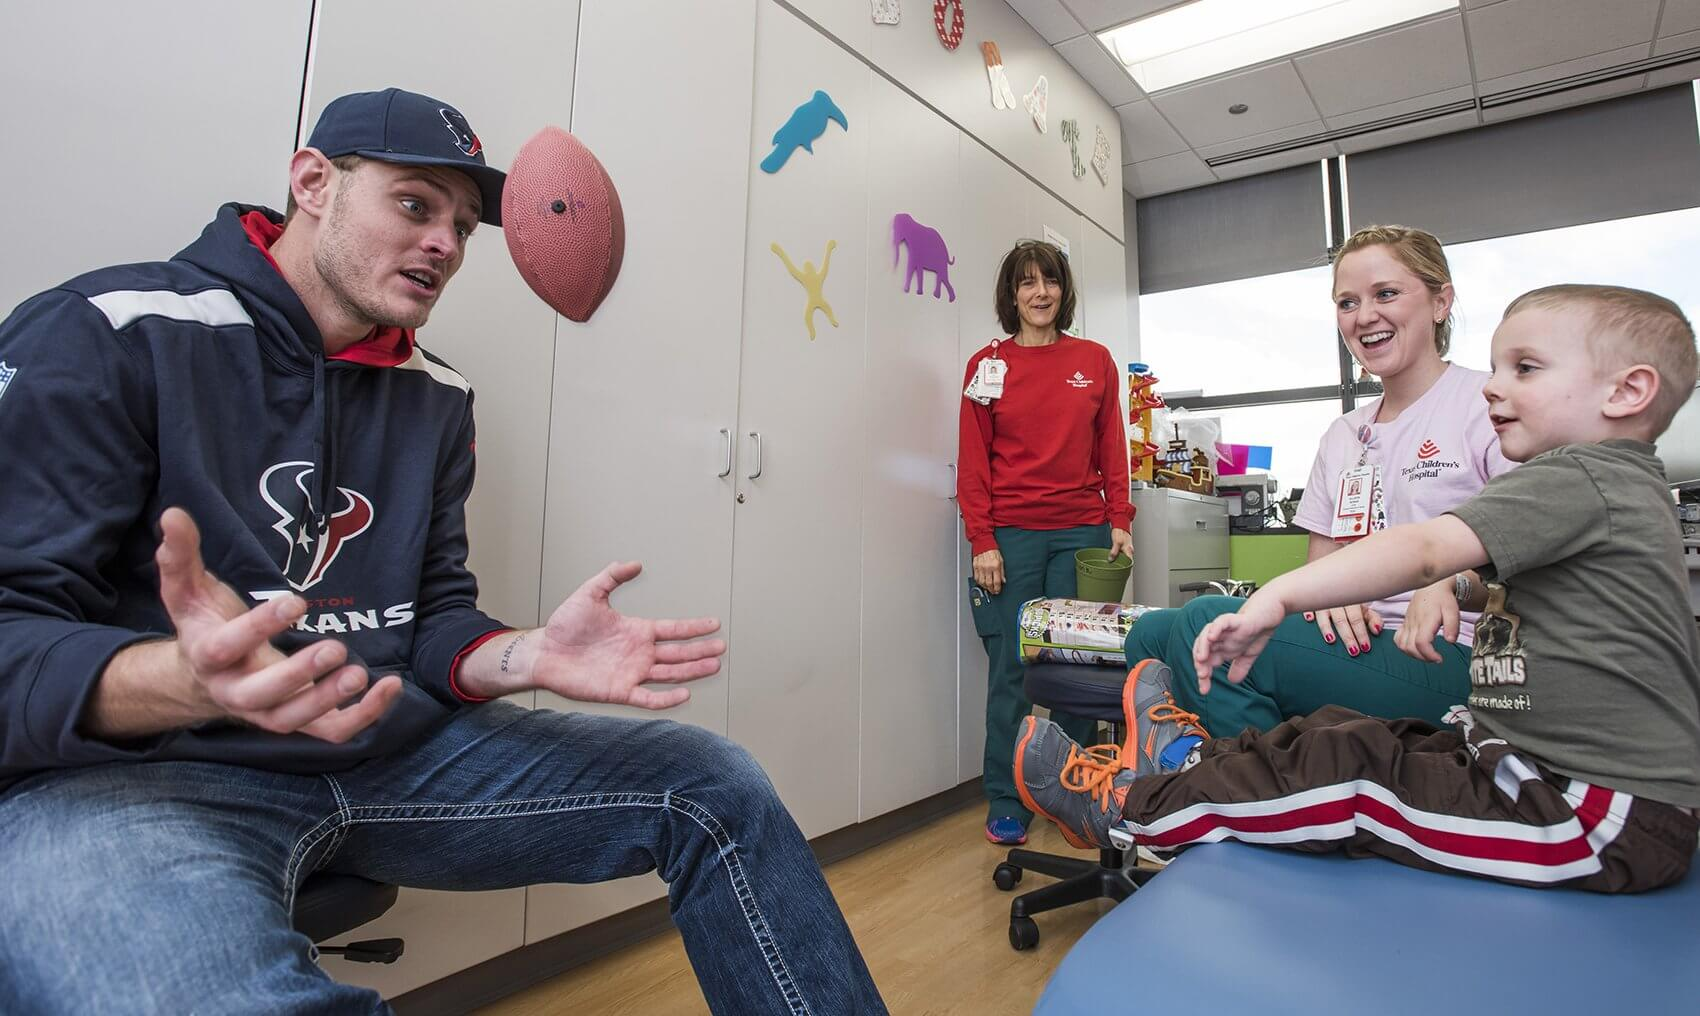 Quarterback Ryan Mallett shows Braydon Nelson how he makes a catch. (Credit: Allen S. Kramer/Texas Children's Hospital)